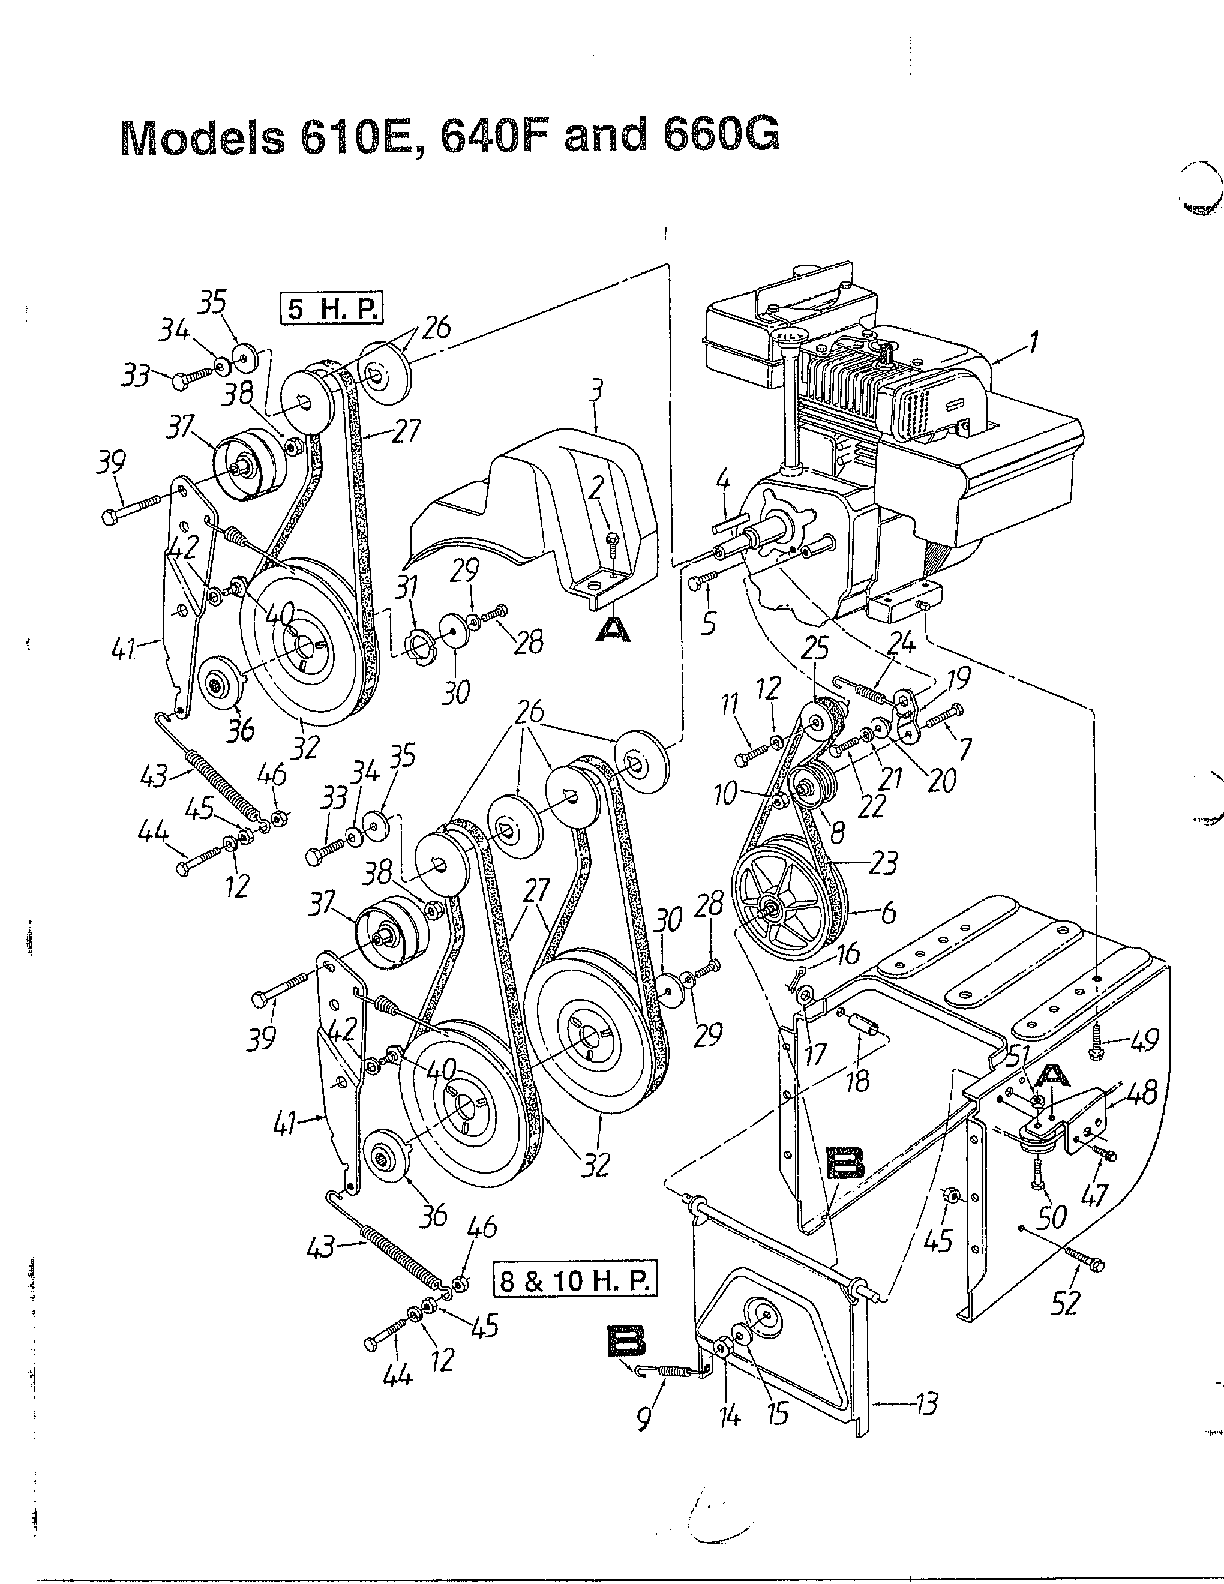 hight resolution of looking for mtd model 313 610e000 gas snowblower repair mtd pro snowblower parts diagram mtd 313